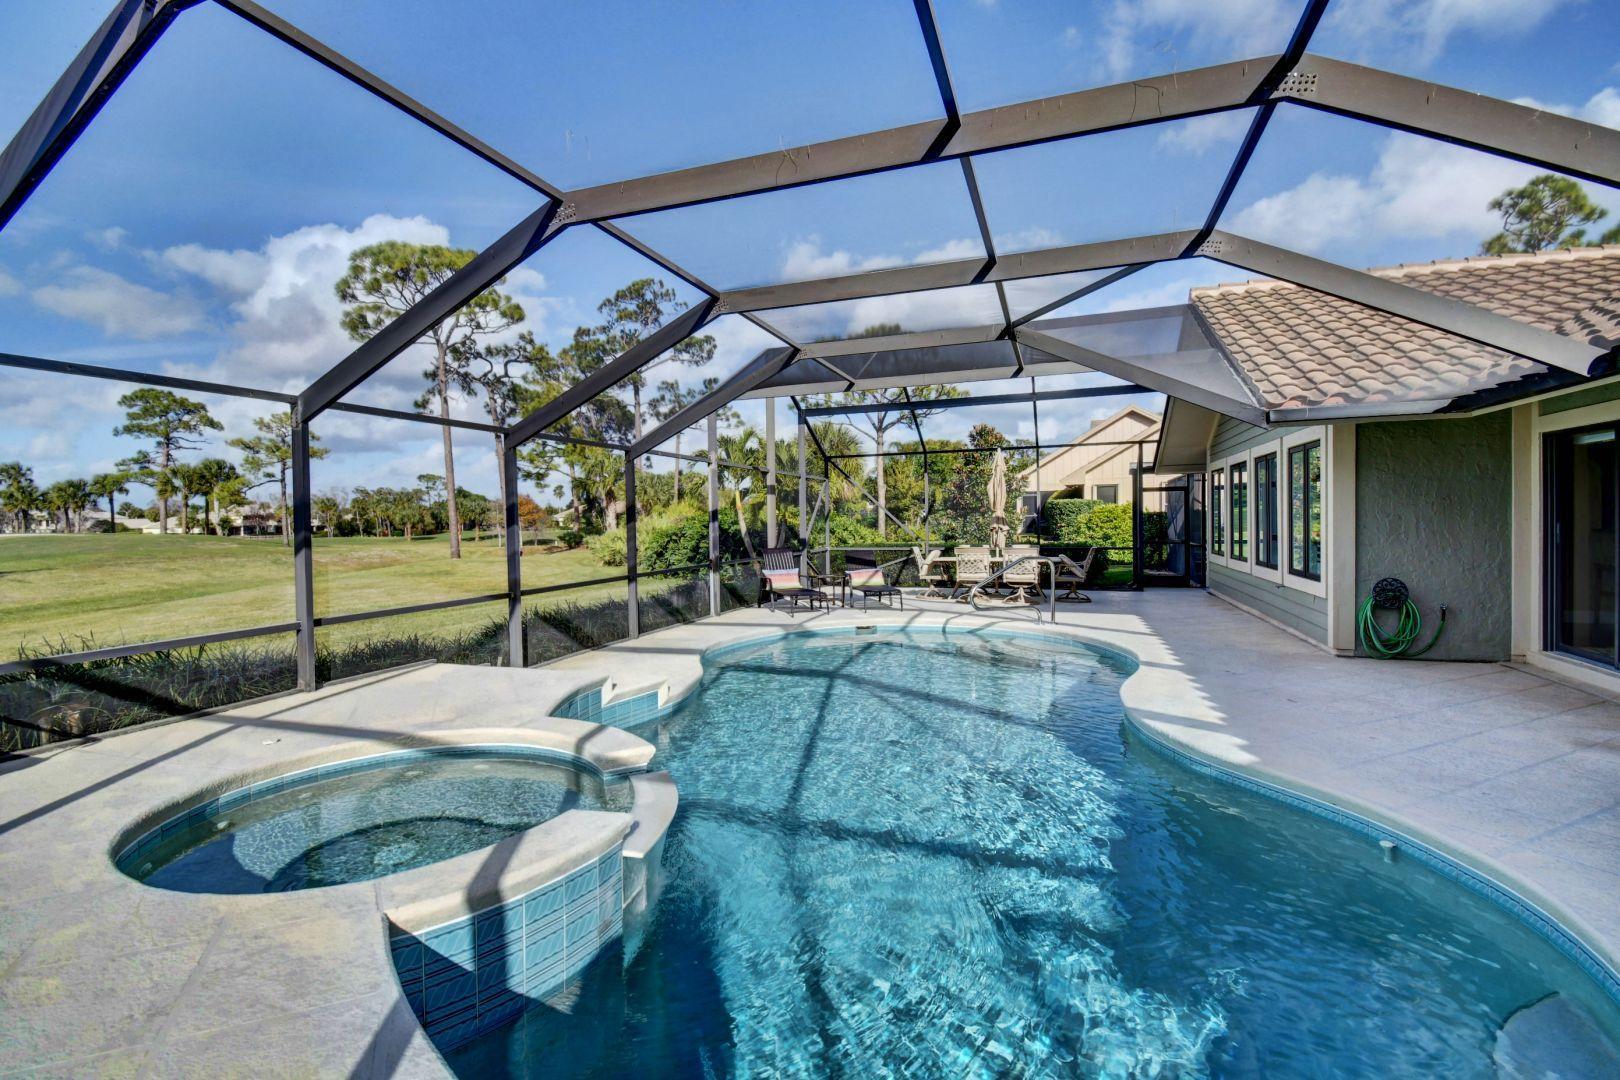 5381 Burning Tree Circle, Stuart, Florida 34997, 3 Bedrooms Bedrooms, ,3 BathroomsBathrooms,A,Single family,Burning Tree,RX-10501414